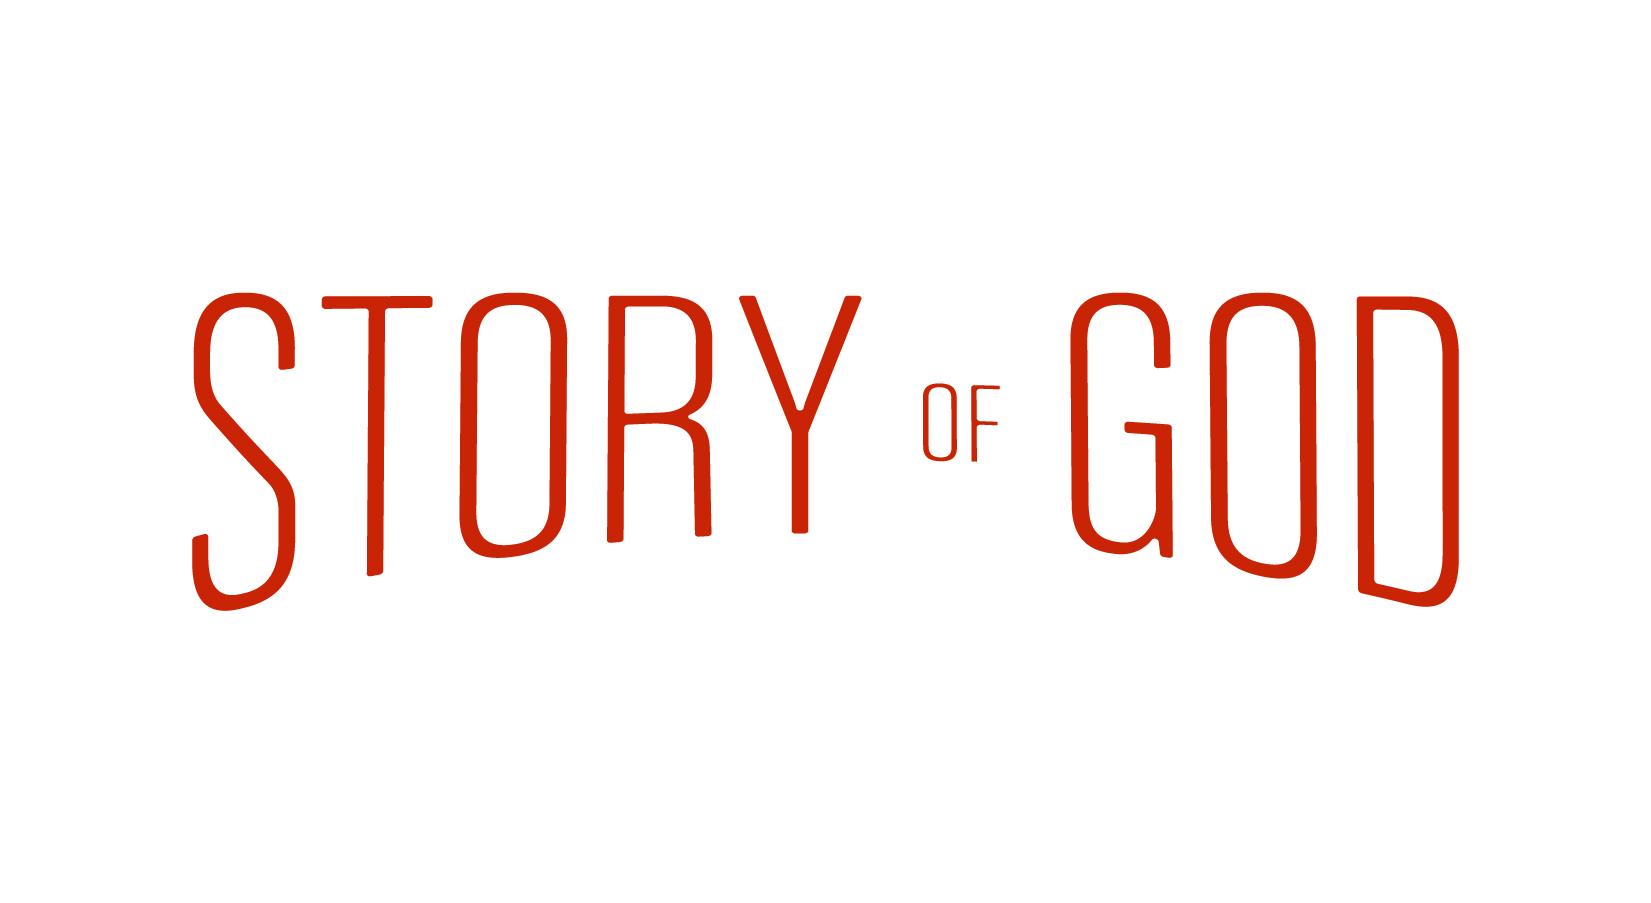 StoryOfGod-Red-text.jpg